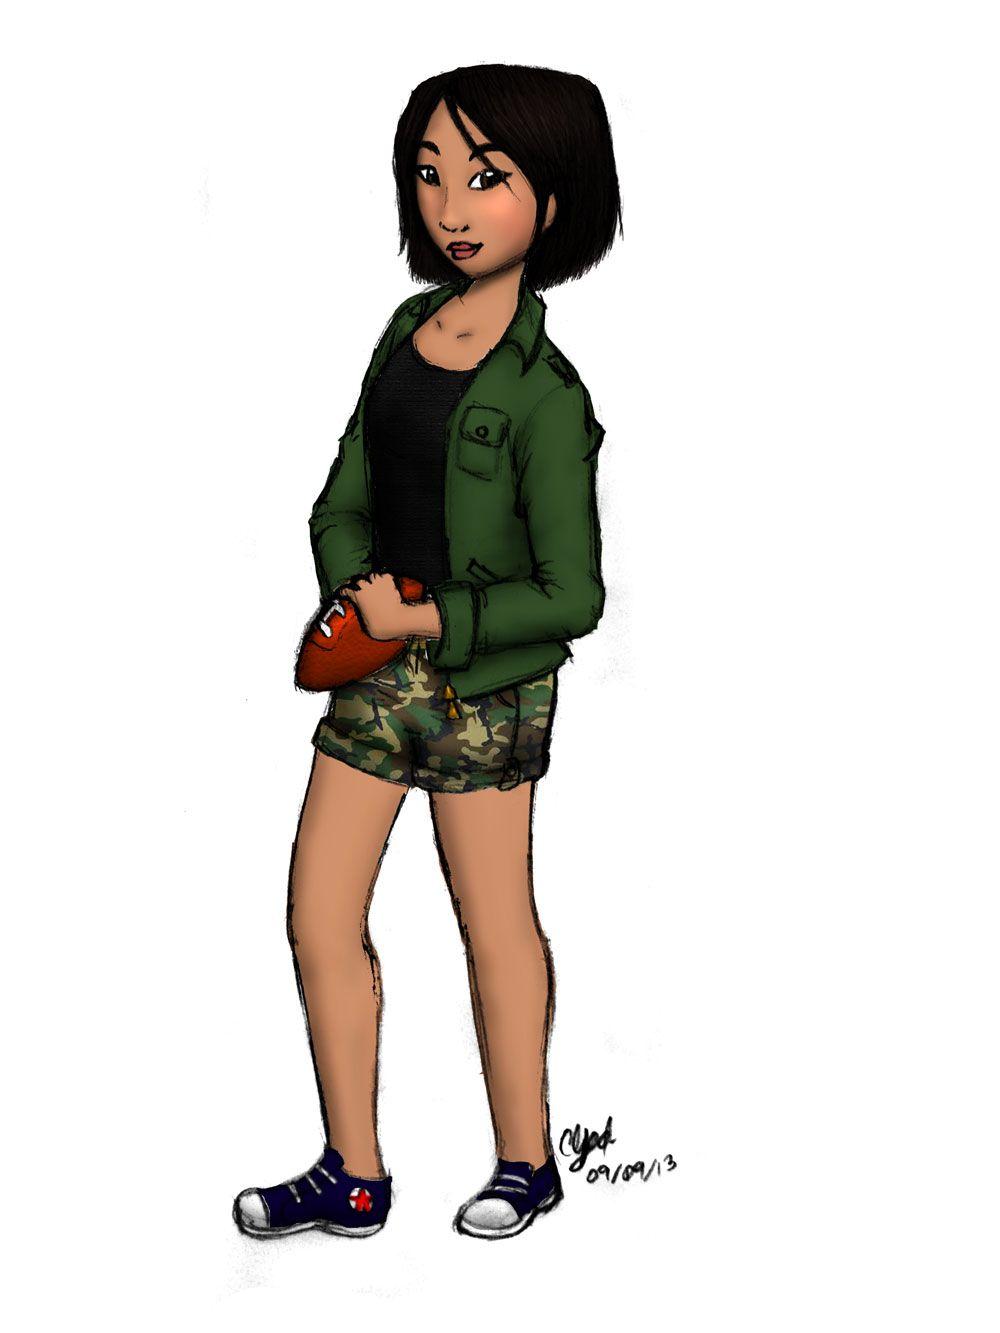 Pin By Samantha Liu On Modern Day Princesses Modern Disney Alternative Disney Princesses Merida Disney